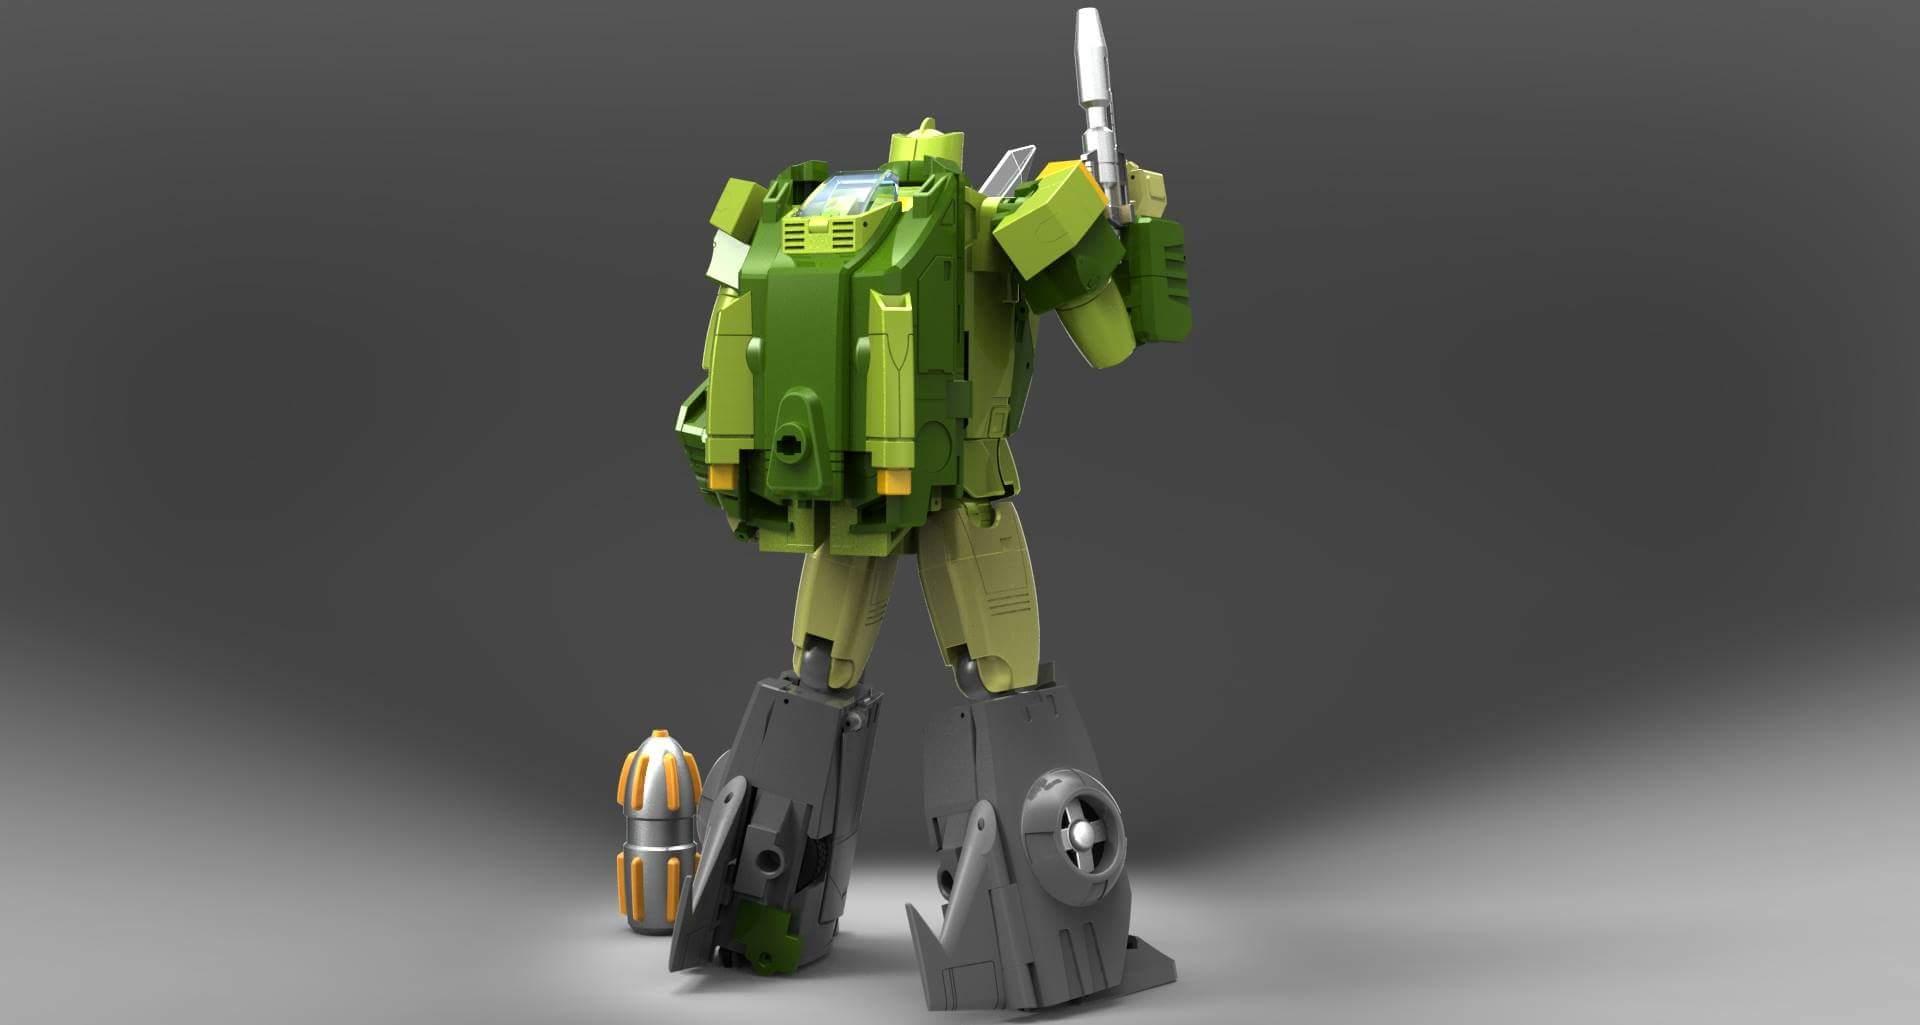 [X-Transbots] Produit Tiers - Jouets MX-10 Virtus - aka Springer/Ricochet KtmMIbGl